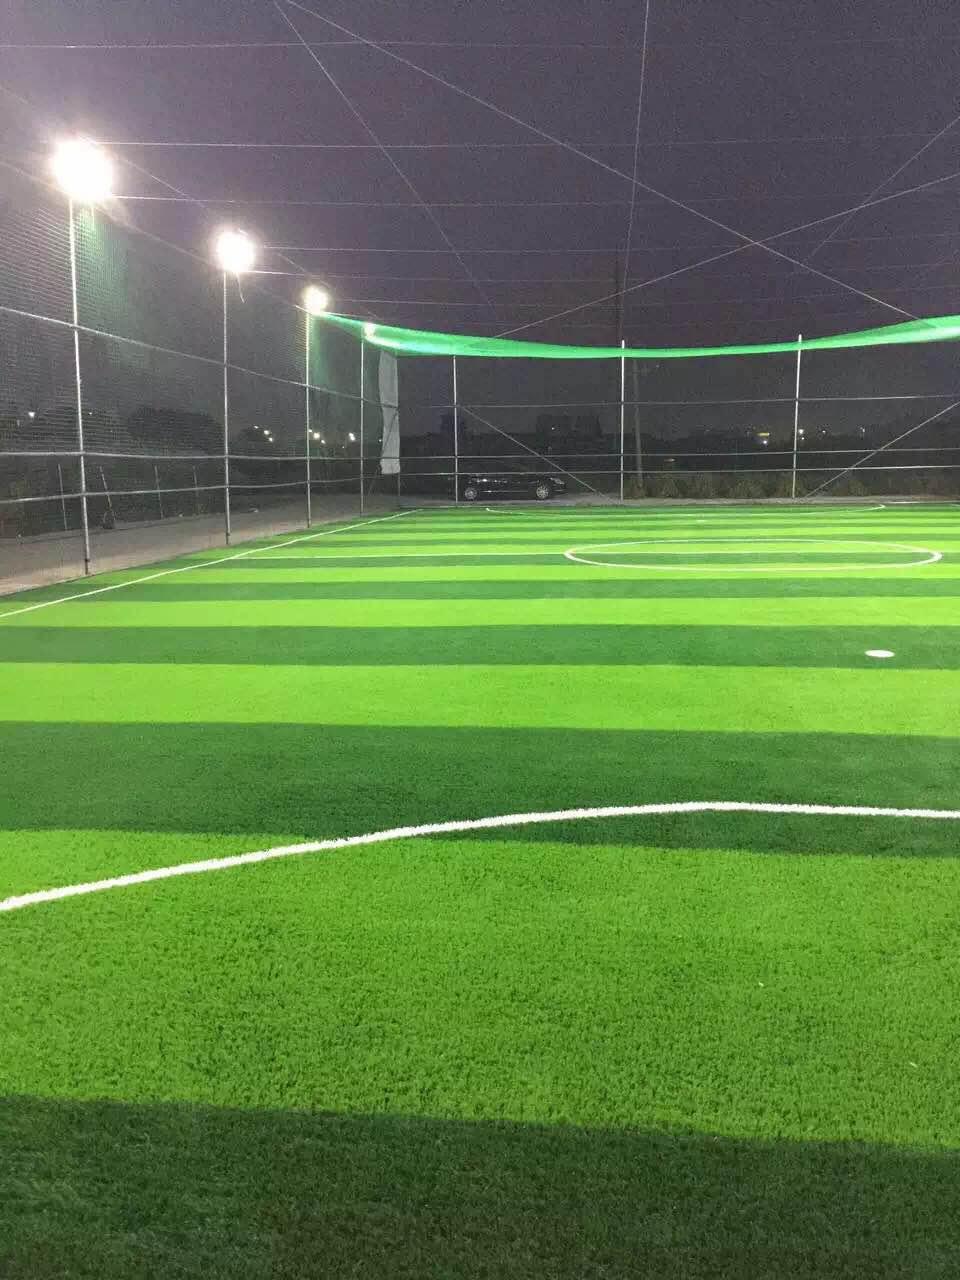 Fujian football stadium manufacturer Fujian Jianye sports facilities engineering supply